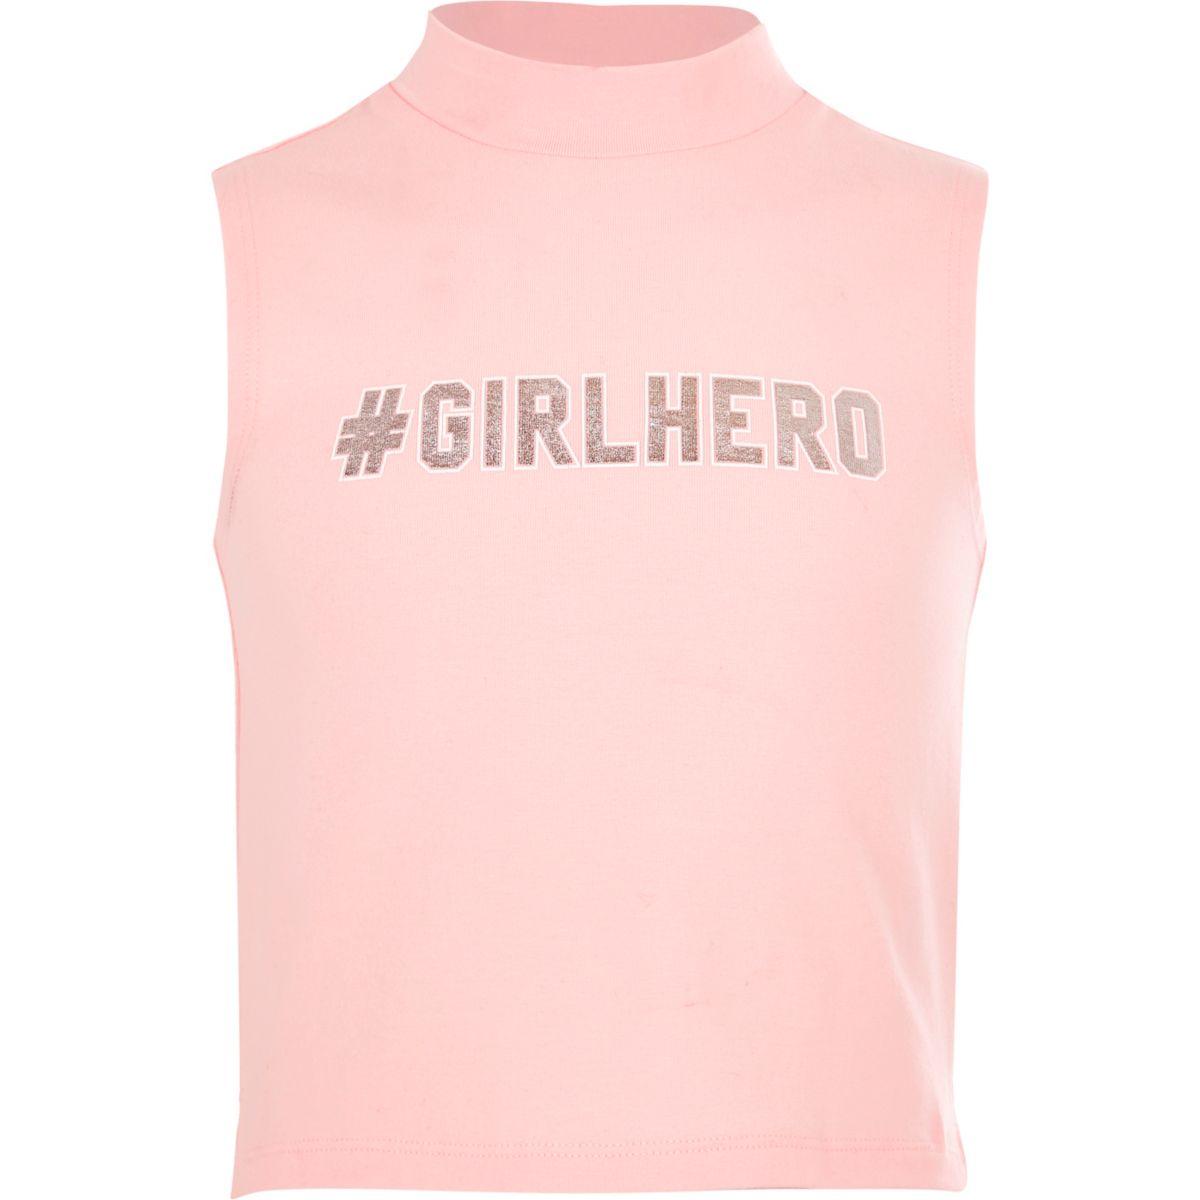 "Tanktop mit Rollkragen ""#Girlhero"""